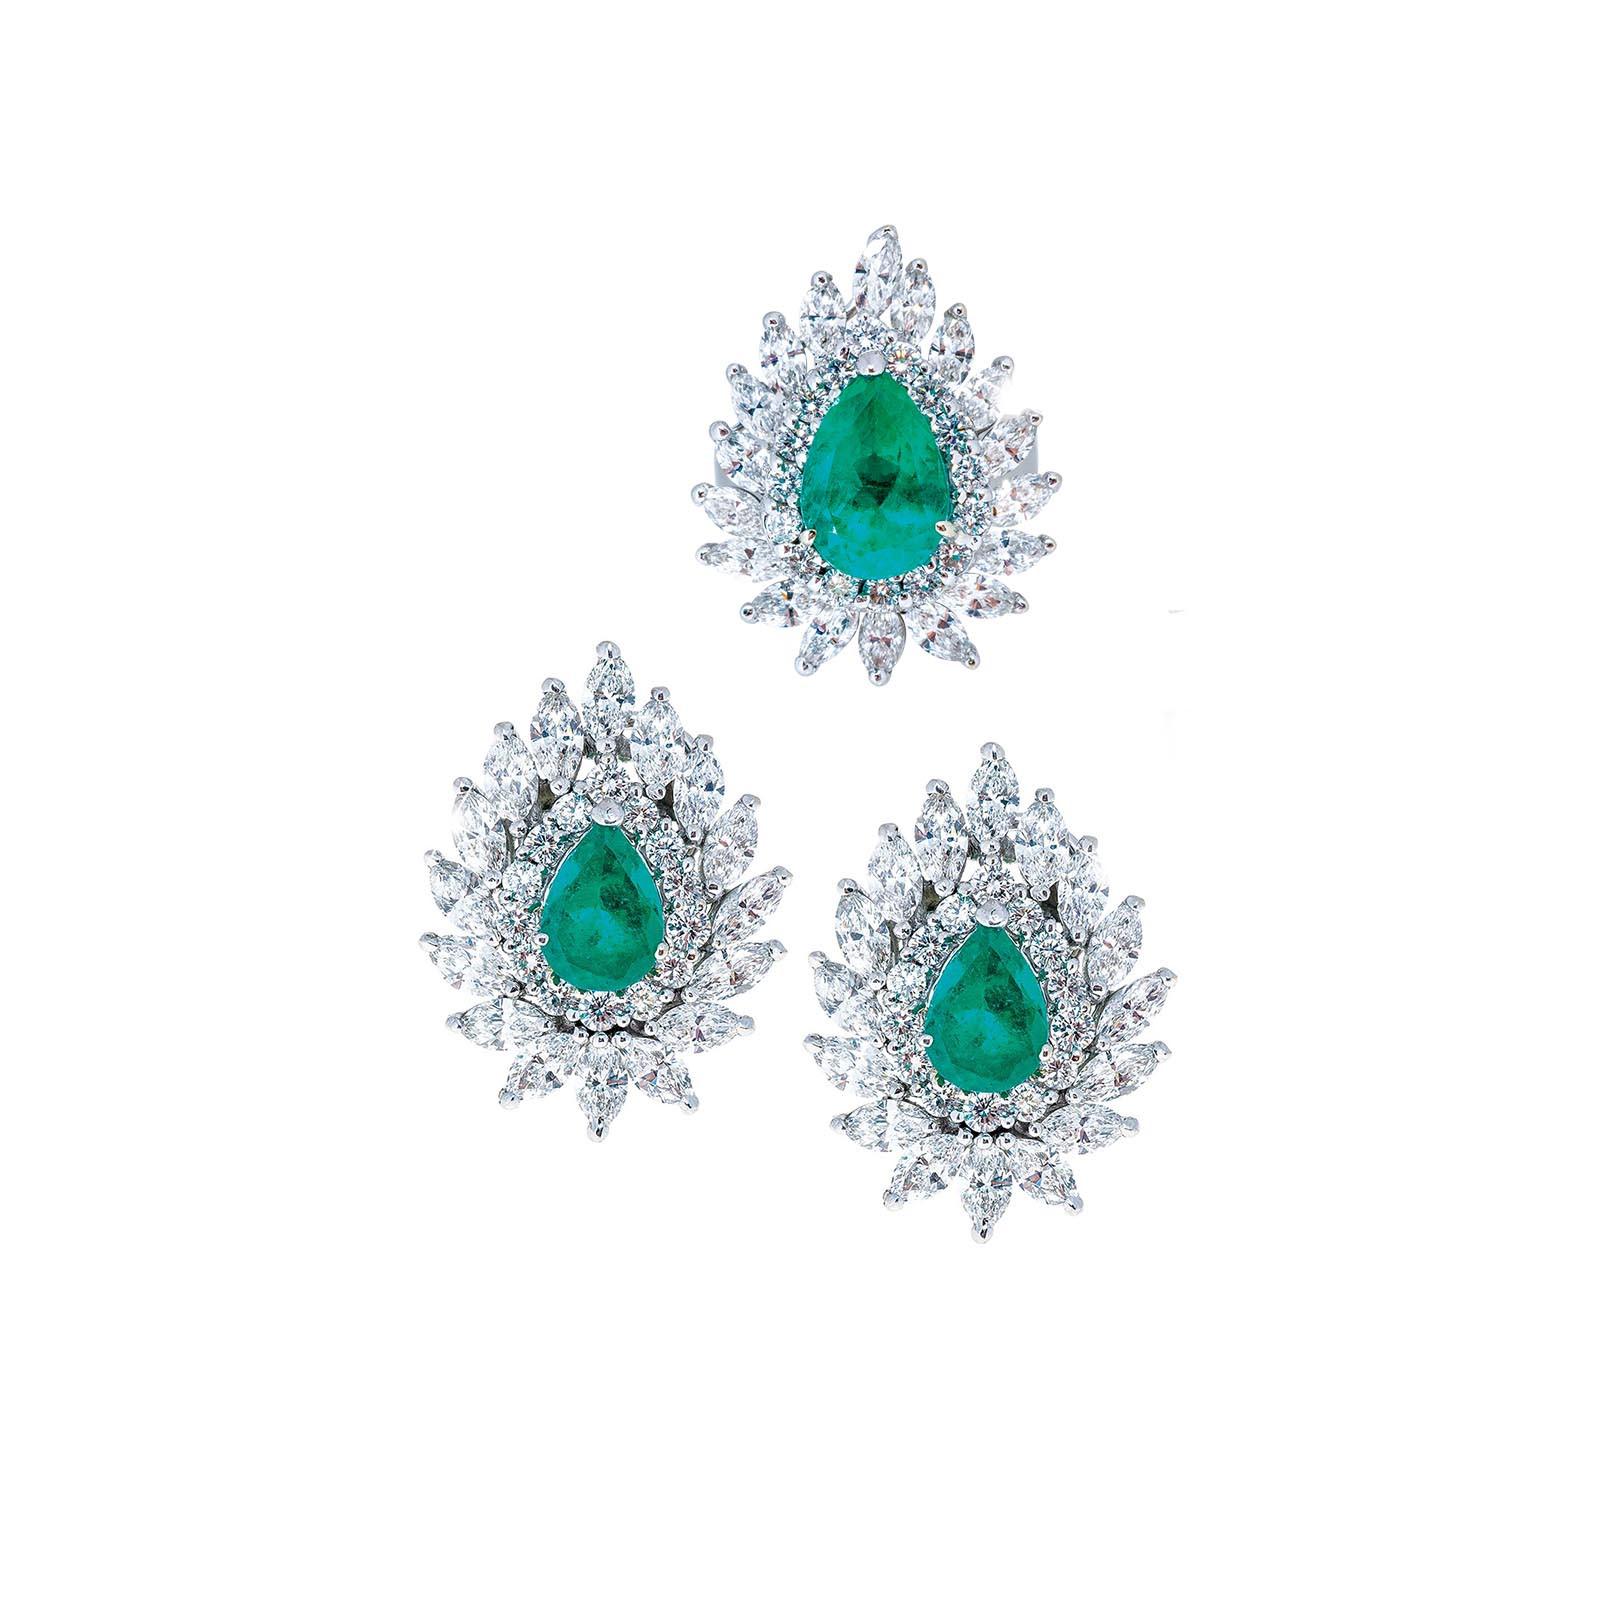 Vintage 14.93 CTW Emerald & Diamond Ring & Earrings Set